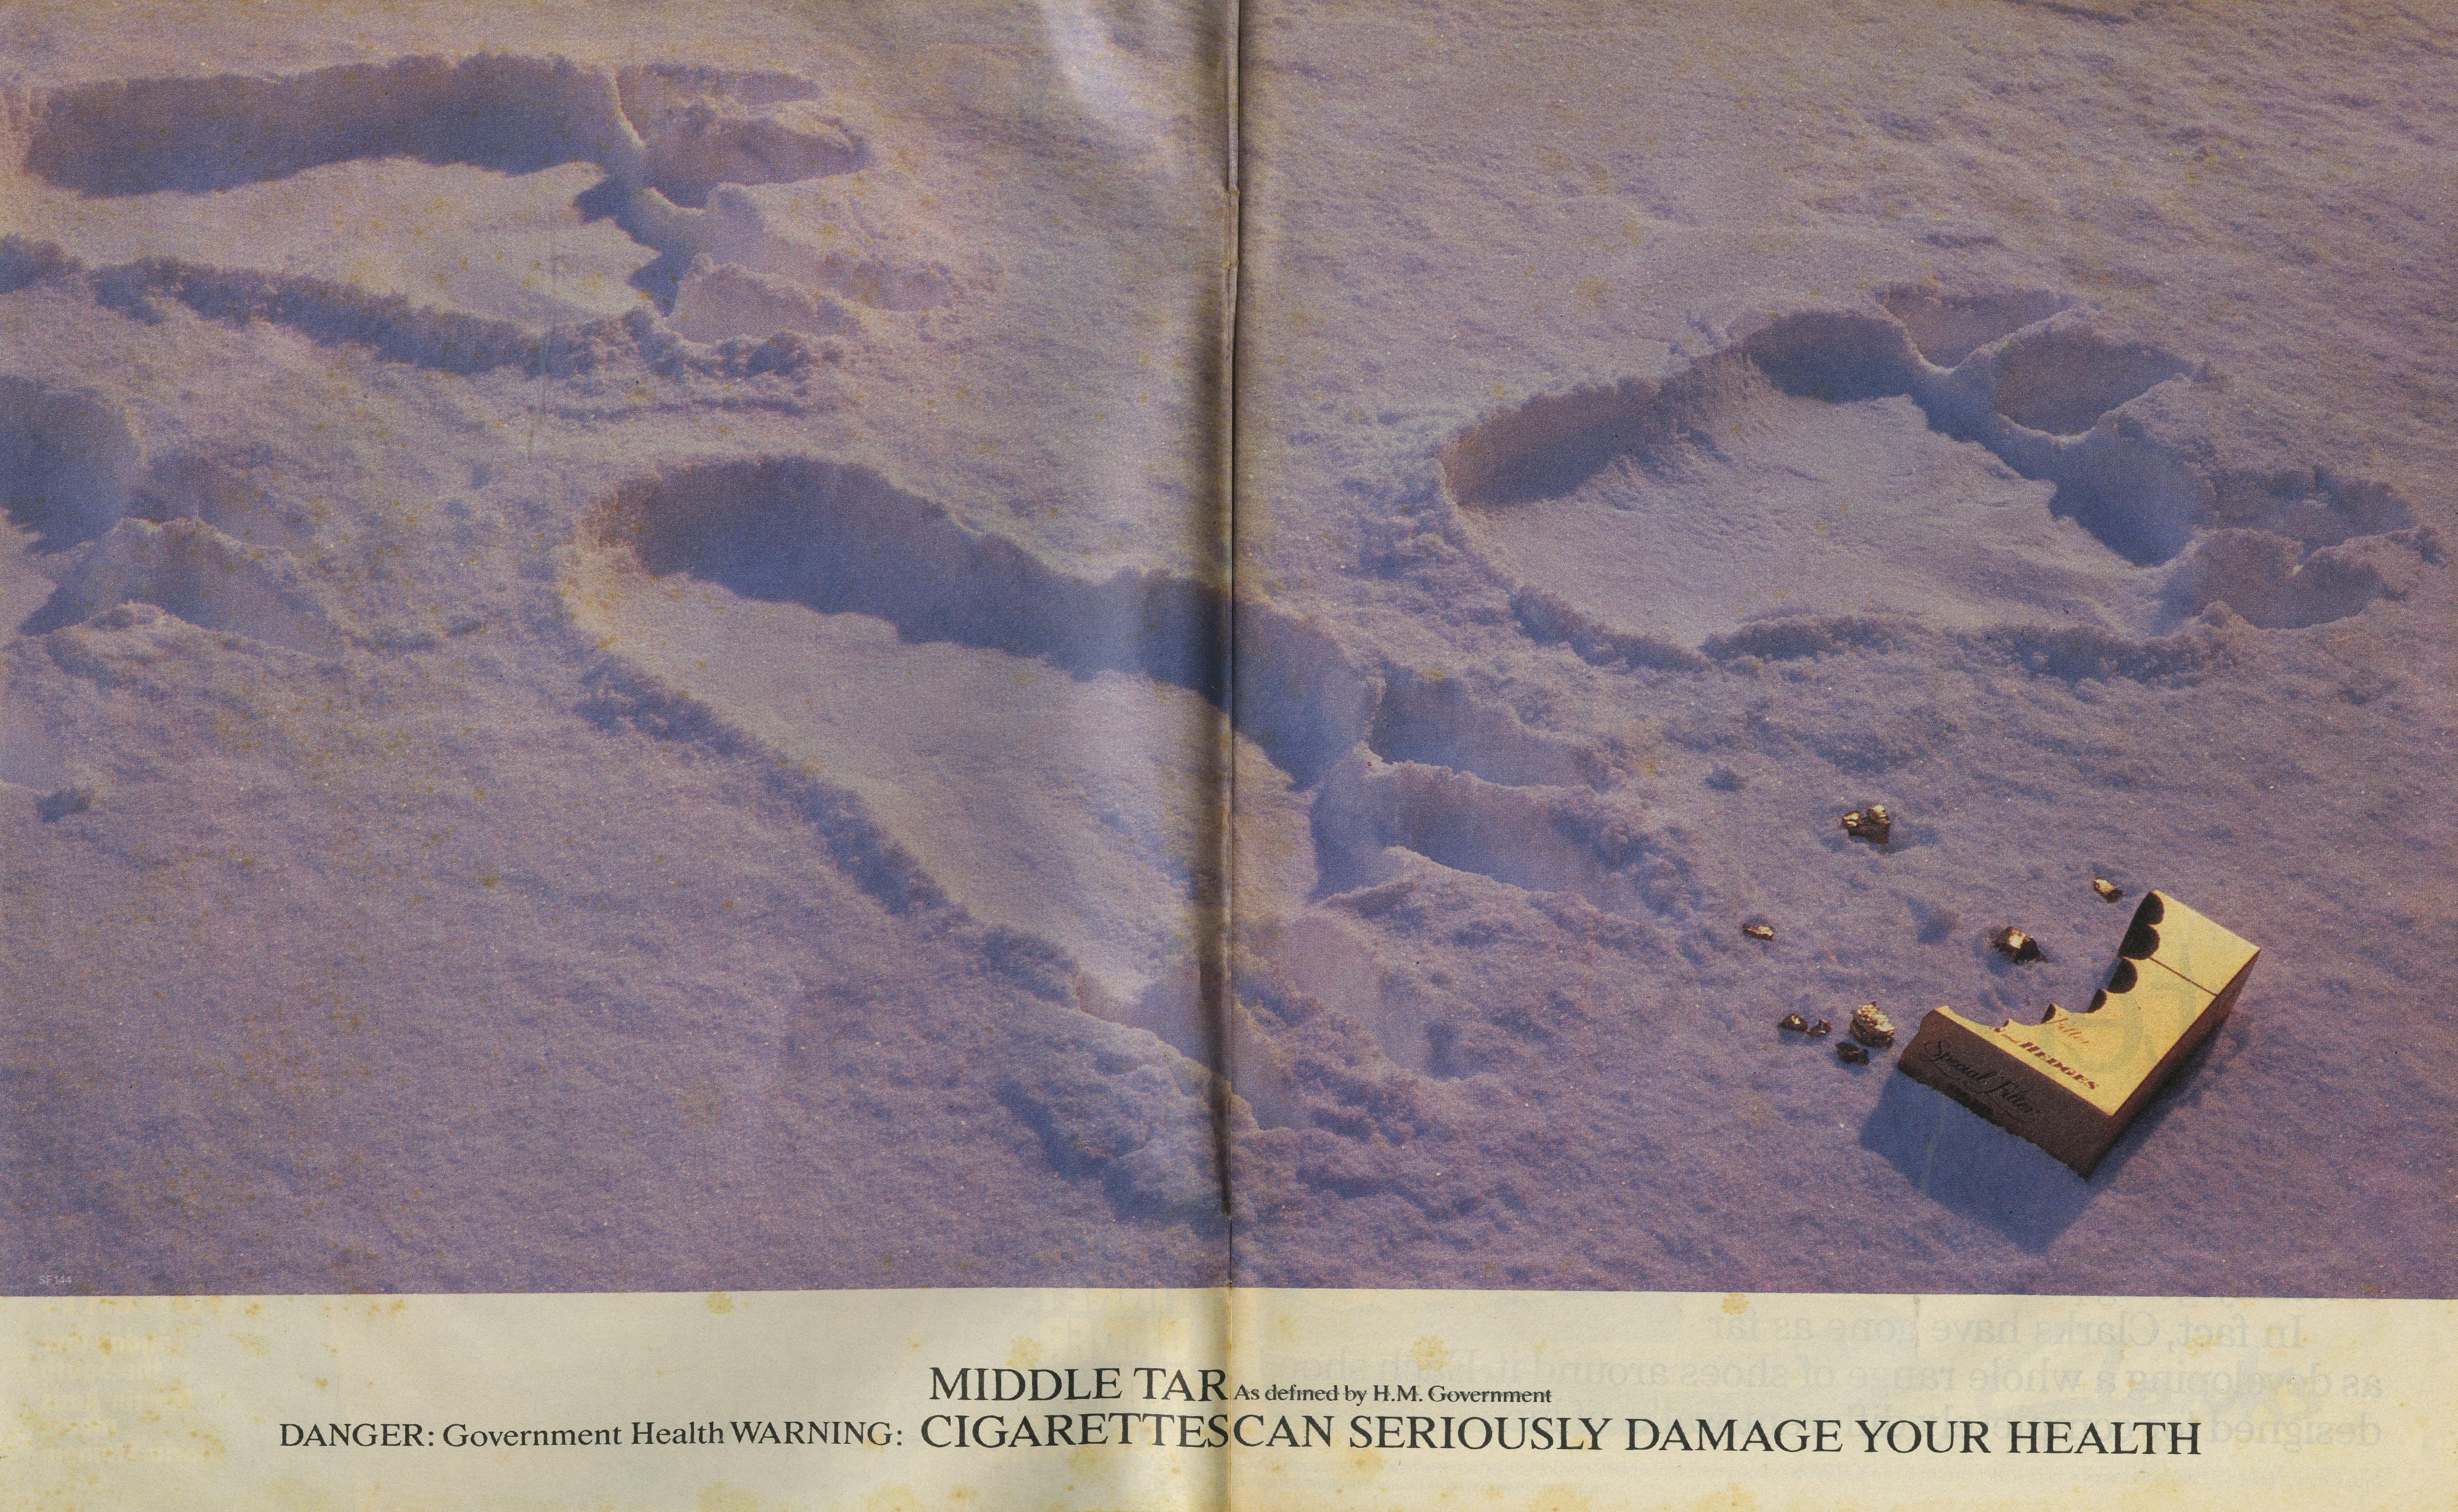 B&H Surreal 'Snow Footprints'-01